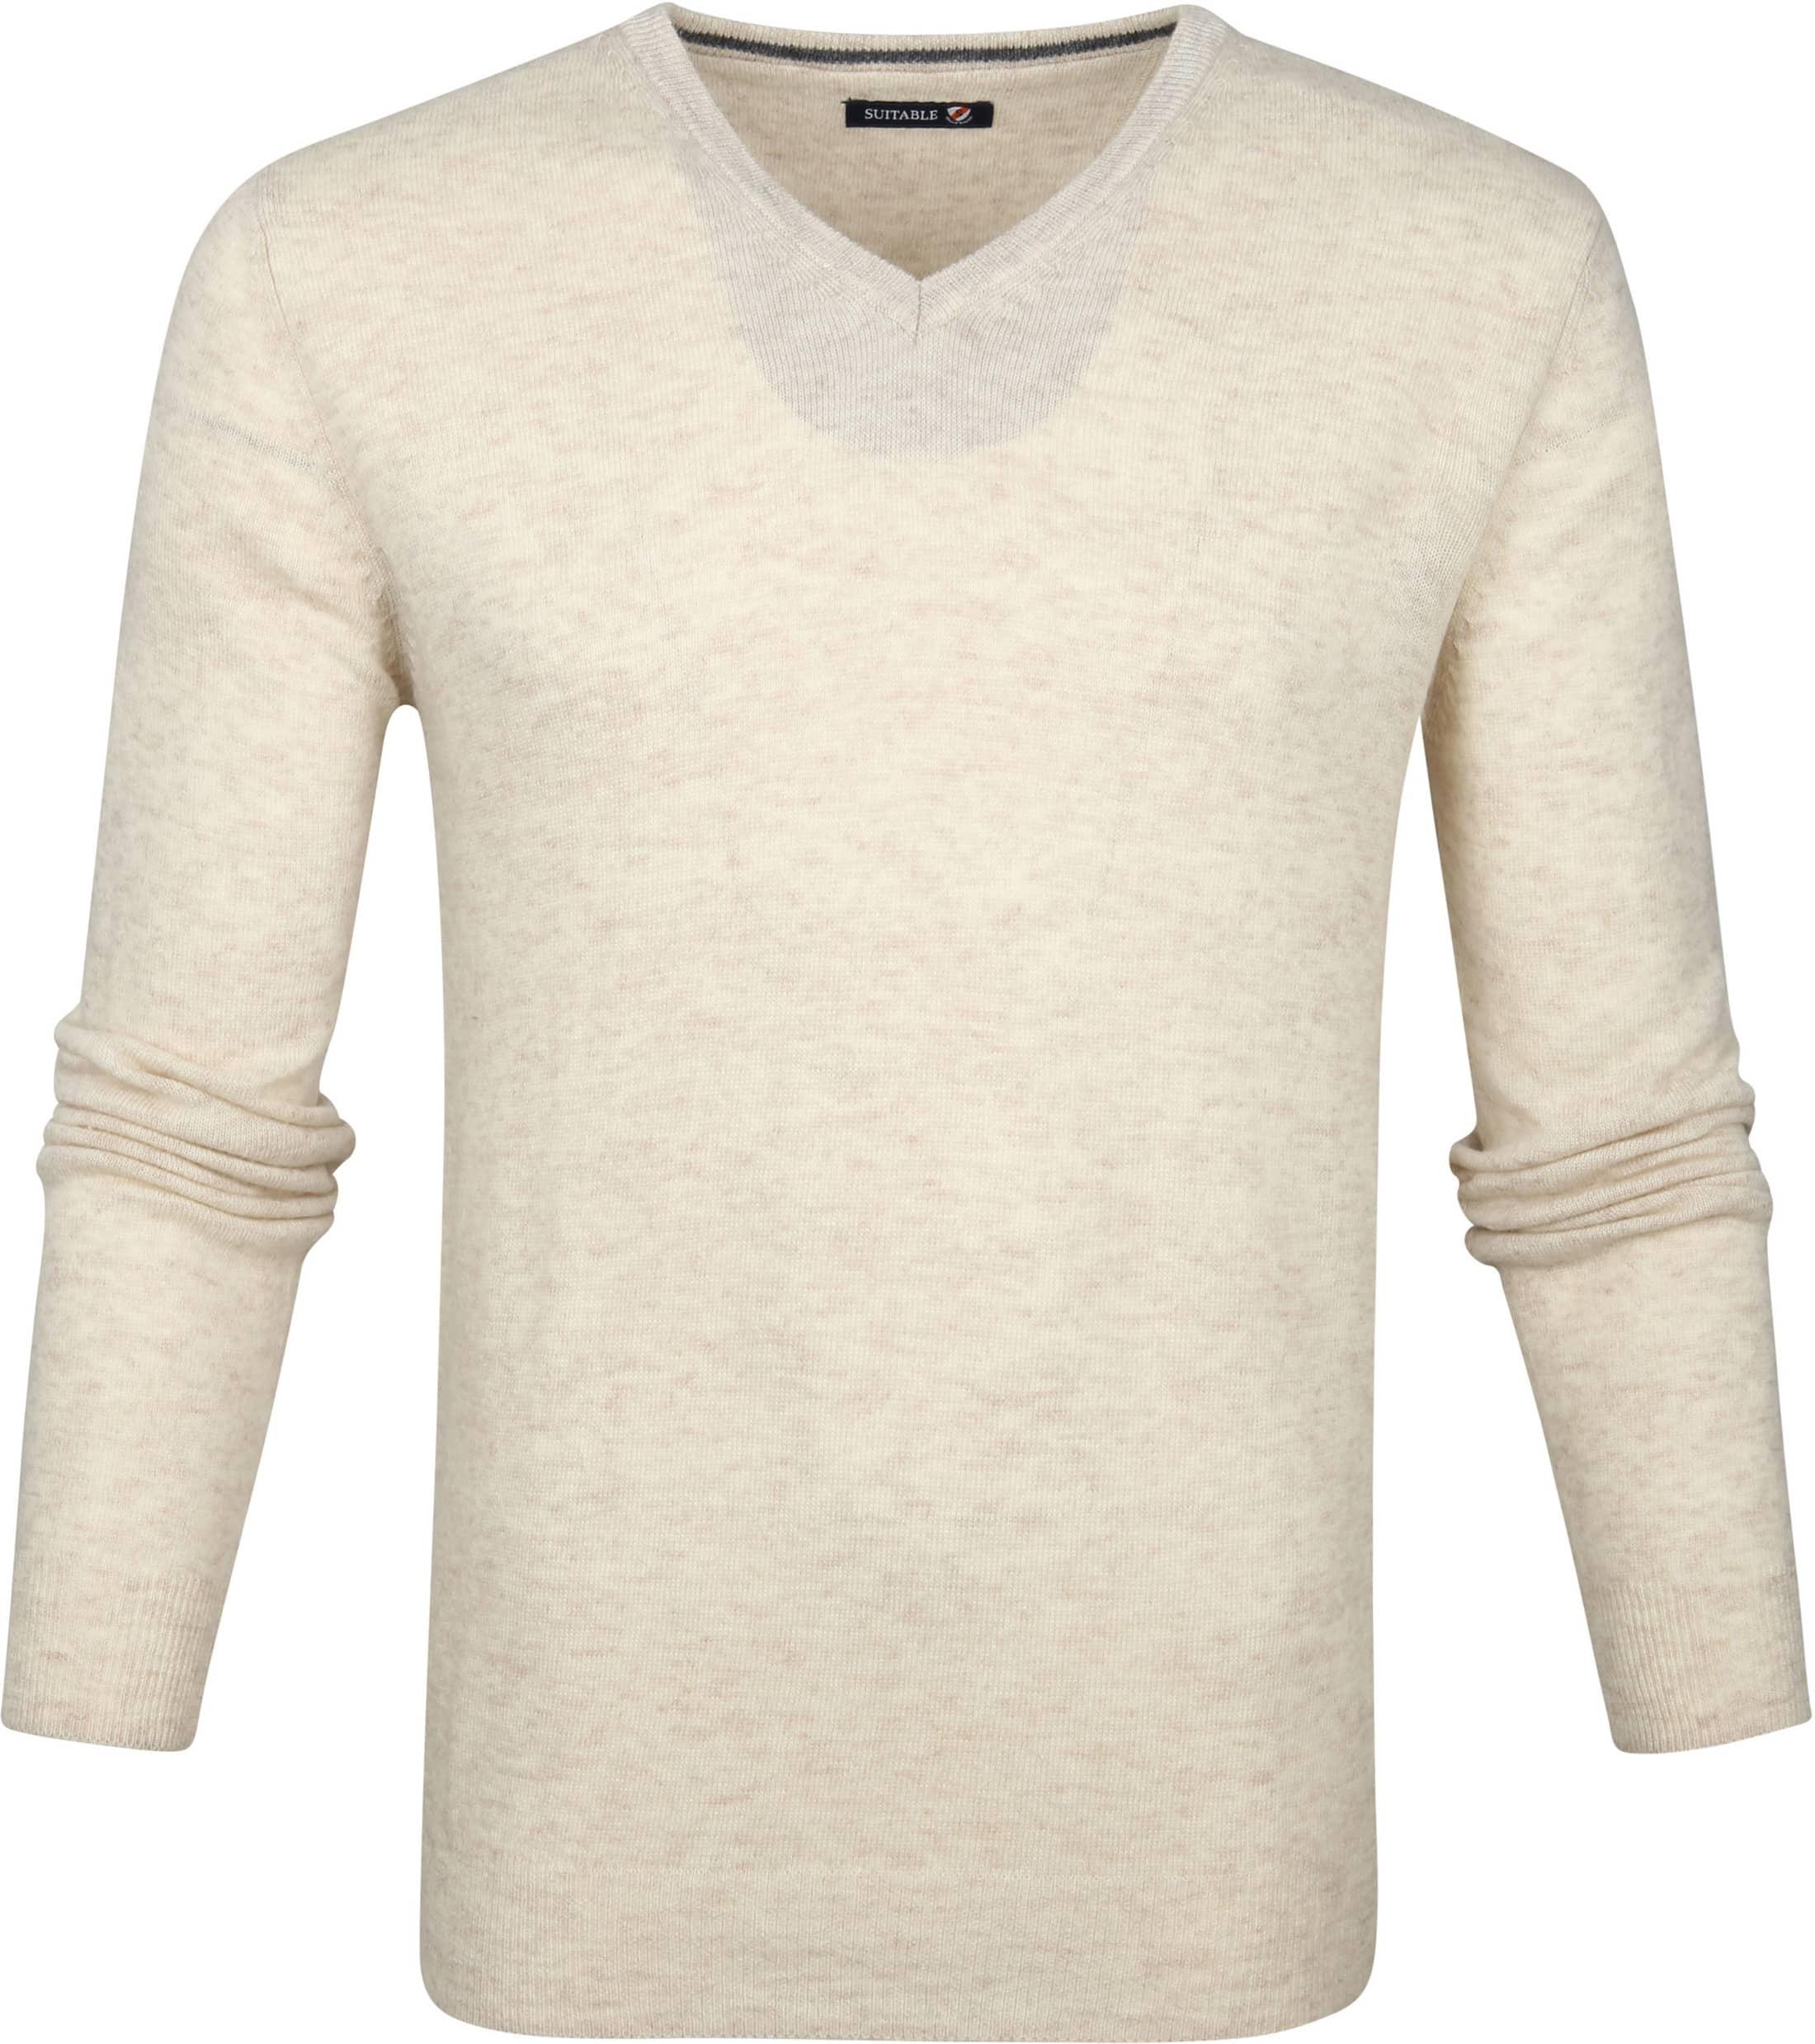 Suitable Lamswol Pullover V-Hals Beige